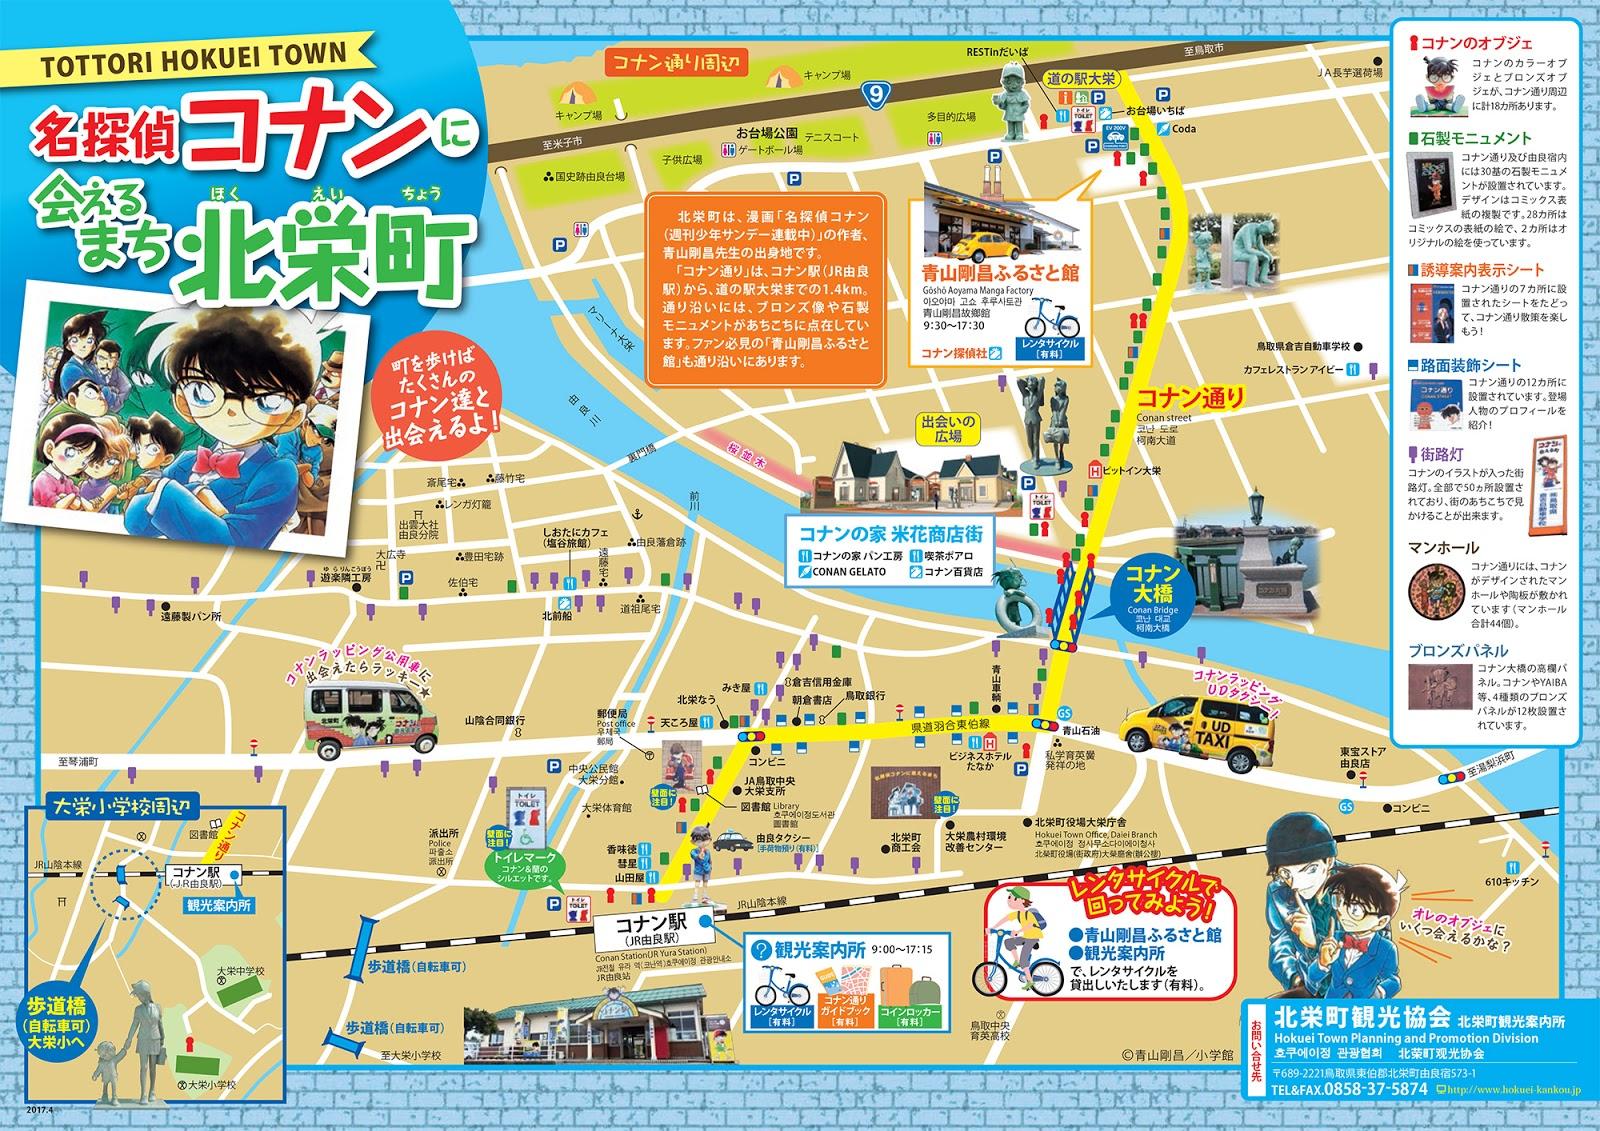 Blue Moon (Travel Blog; Self travel / Backpack / One Day Trip): Gosho Aoyama Manga Factory - Tottori, Japan